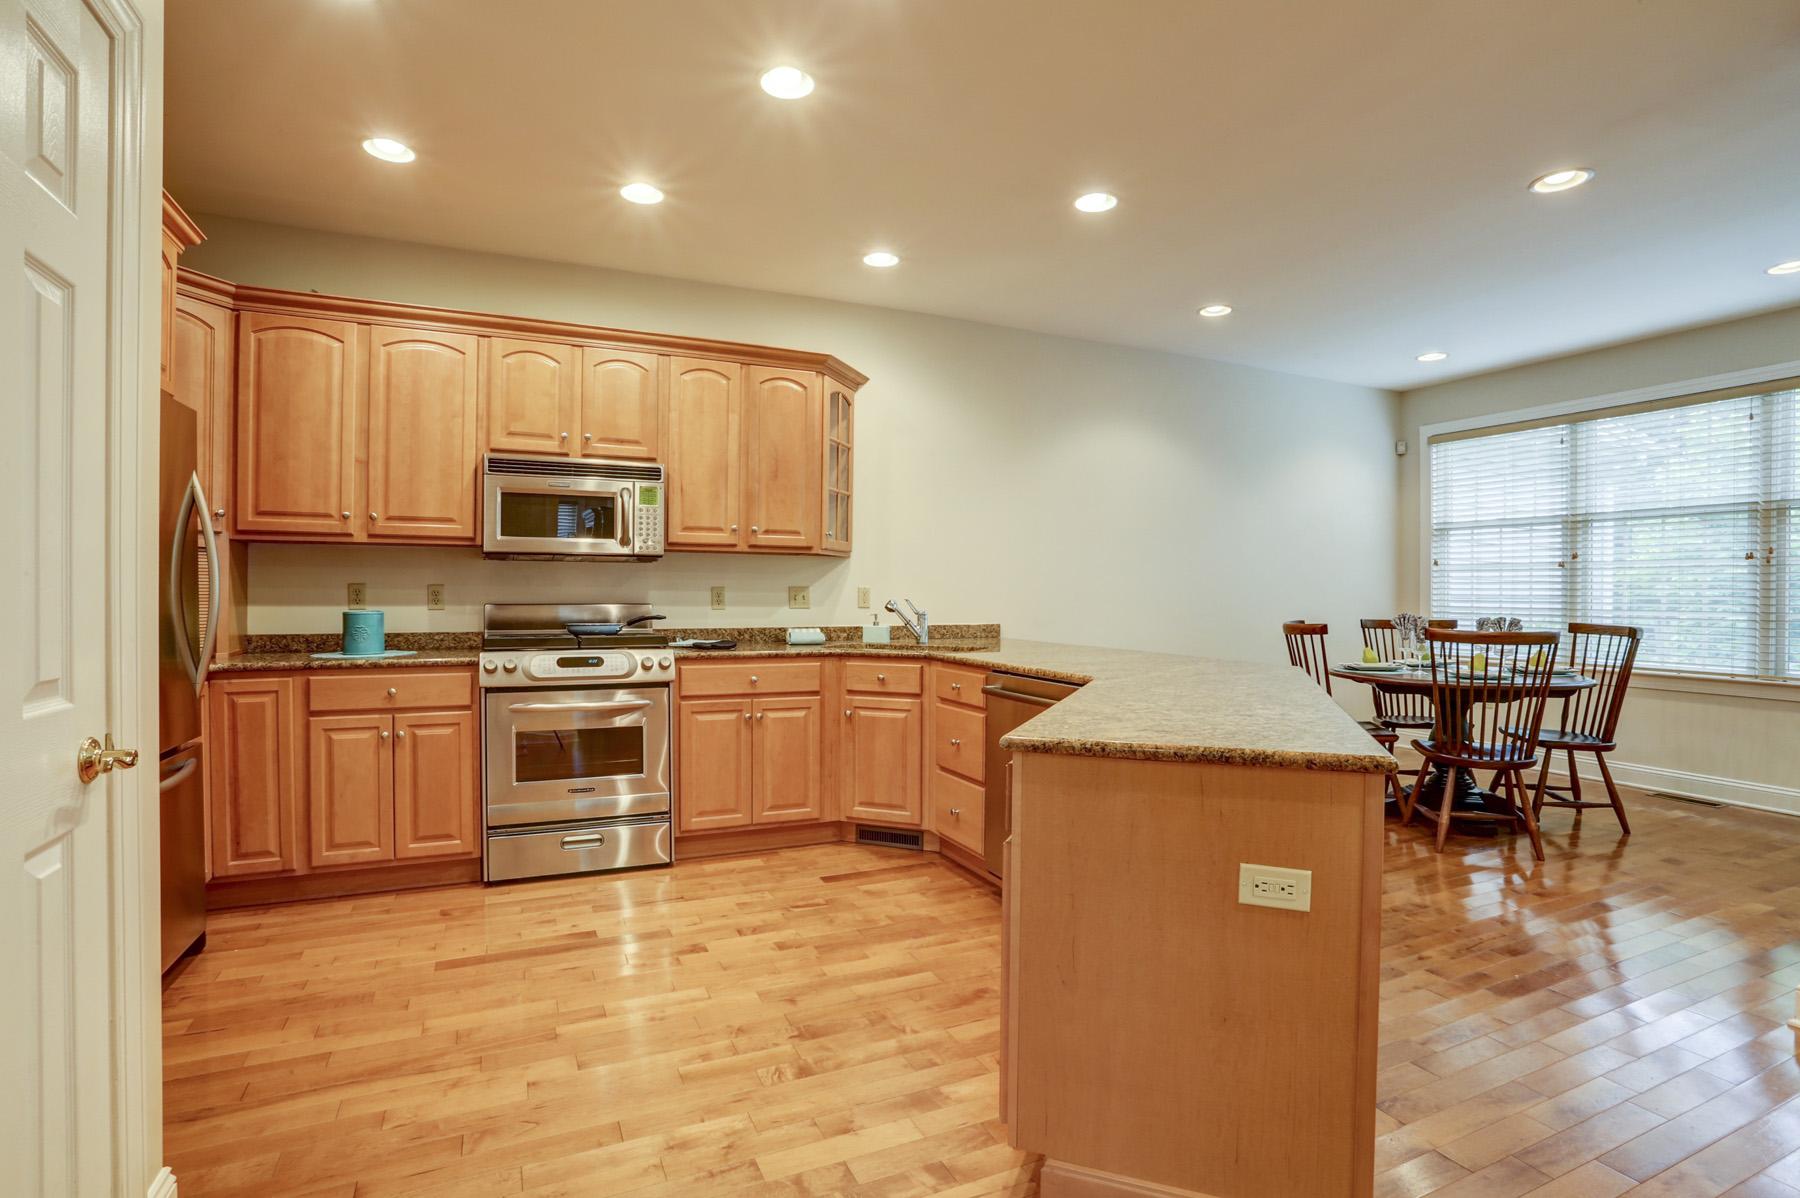 Additional photo for property listing at 640 Northfield Road 640 Northfield Road Lititz, Pennsylvania 17543 Estados Unidos